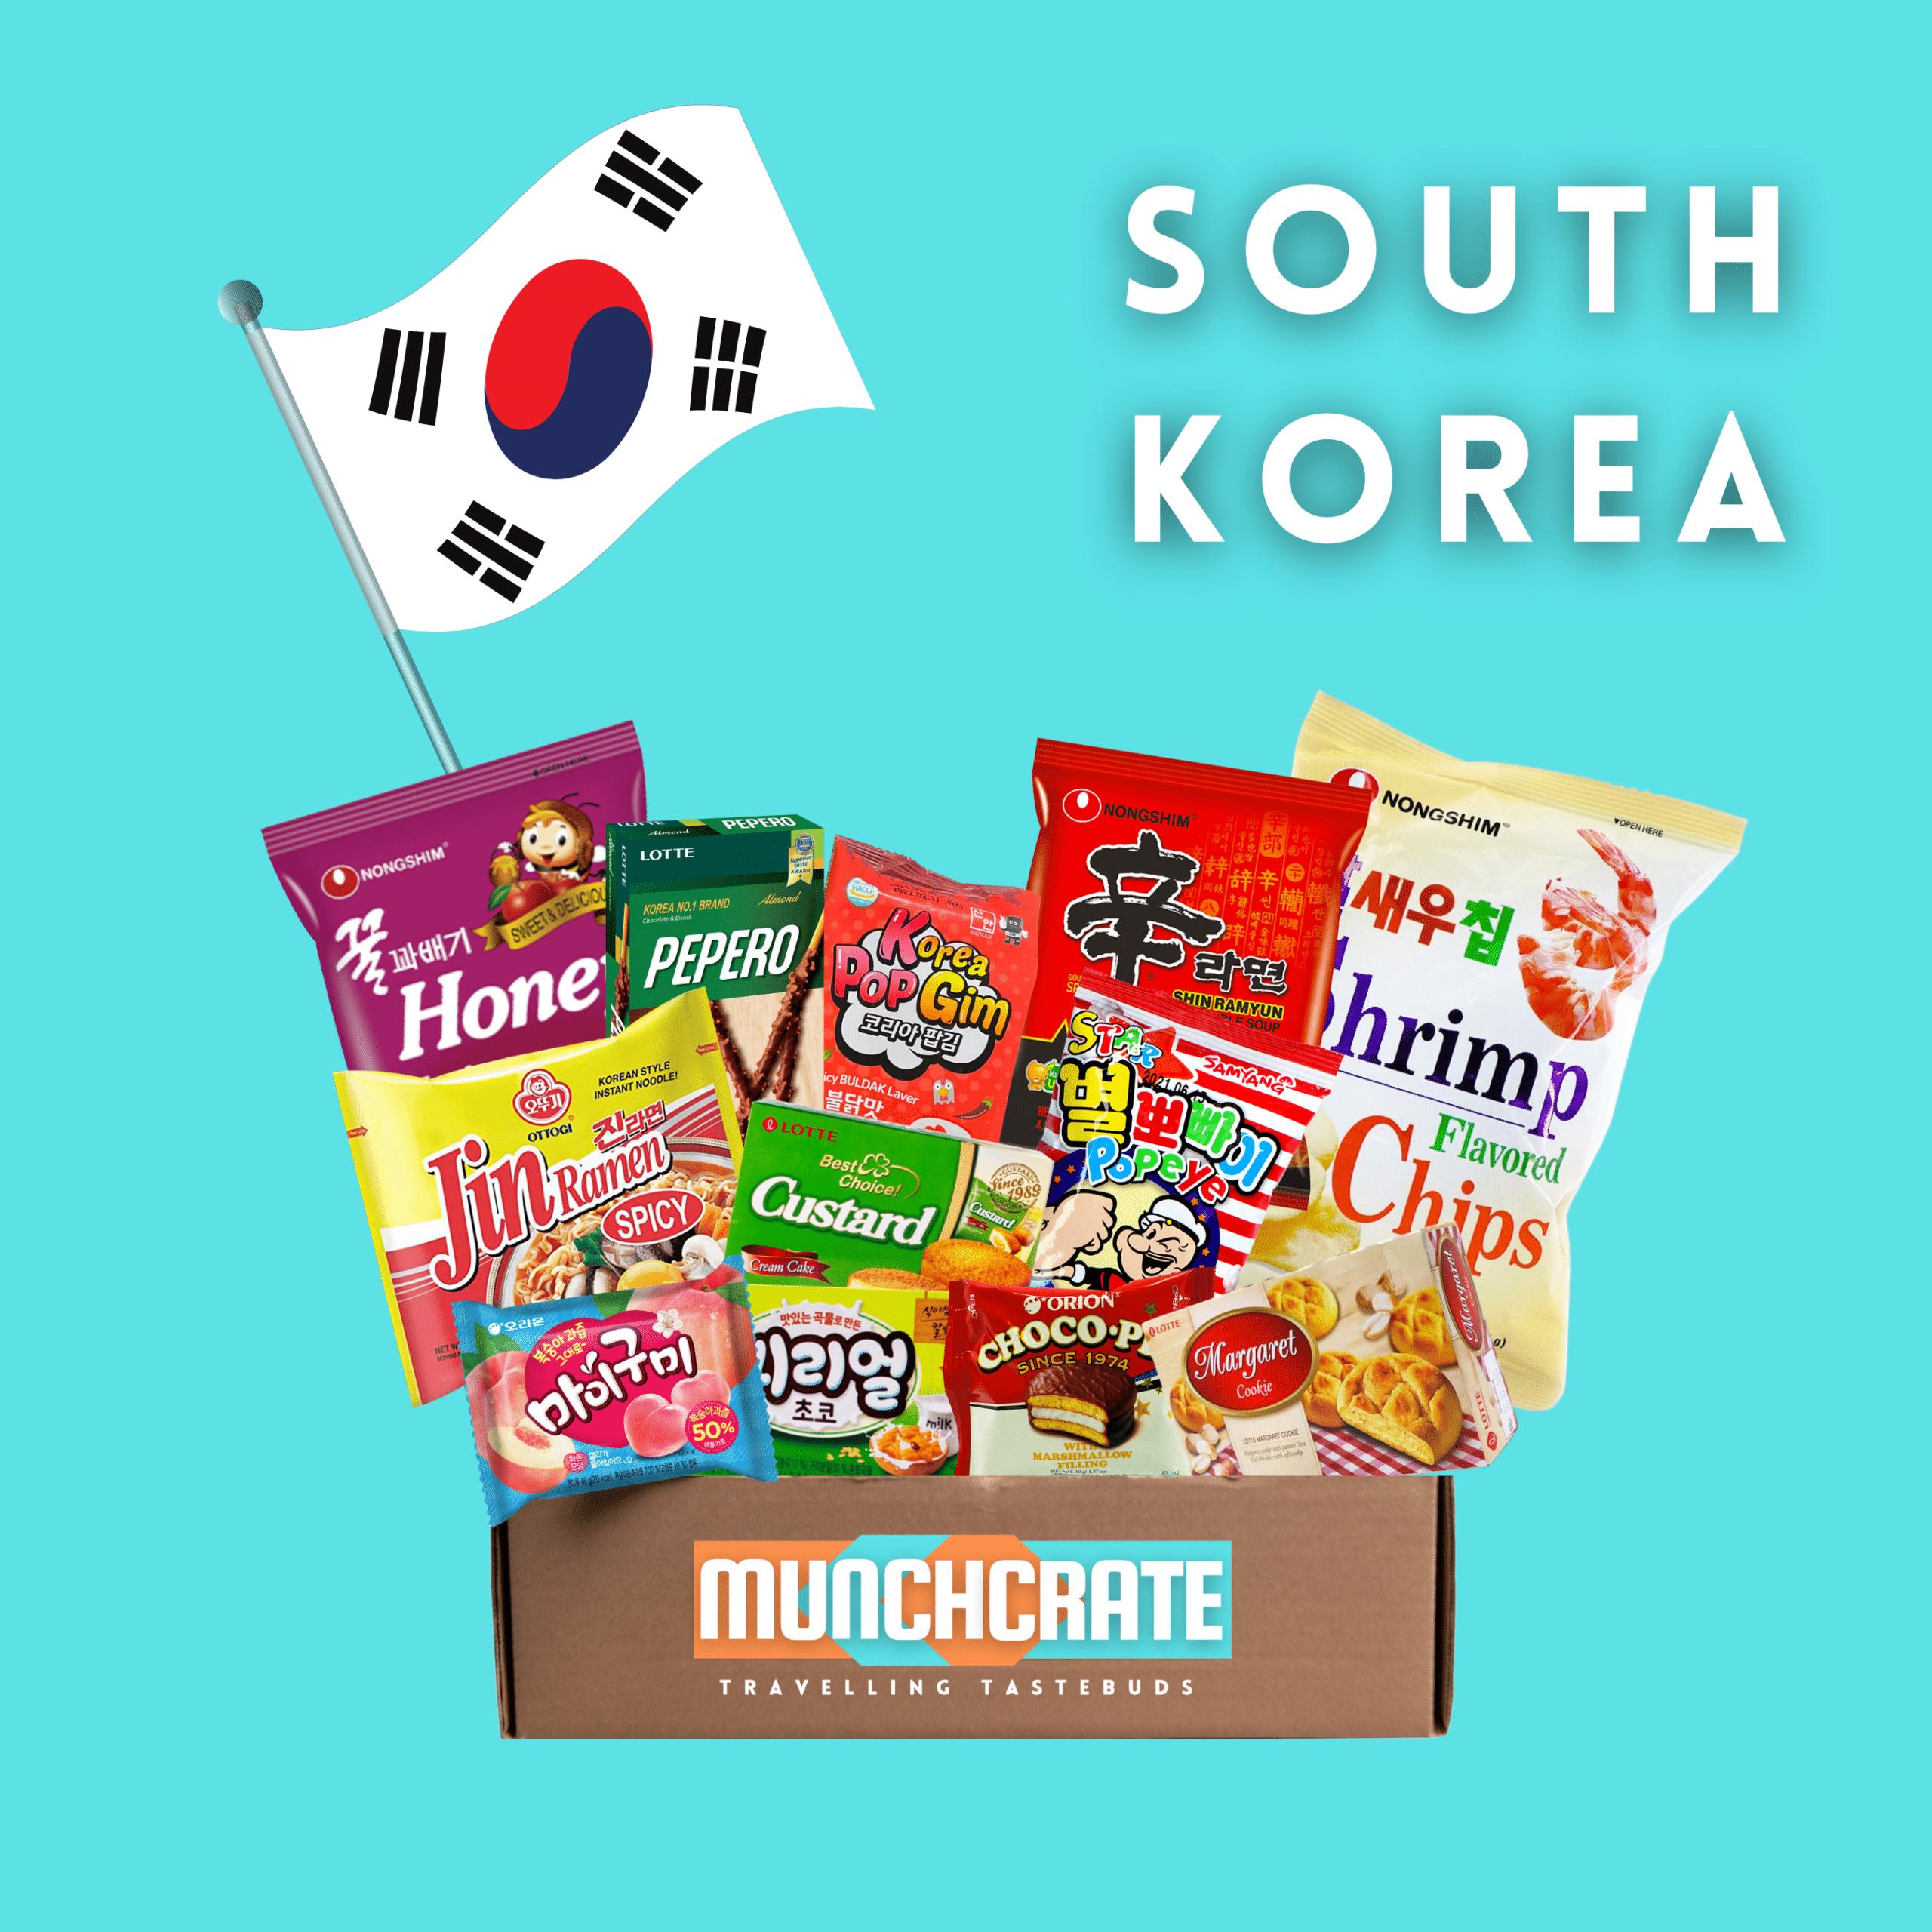 Munch Crate South Korea